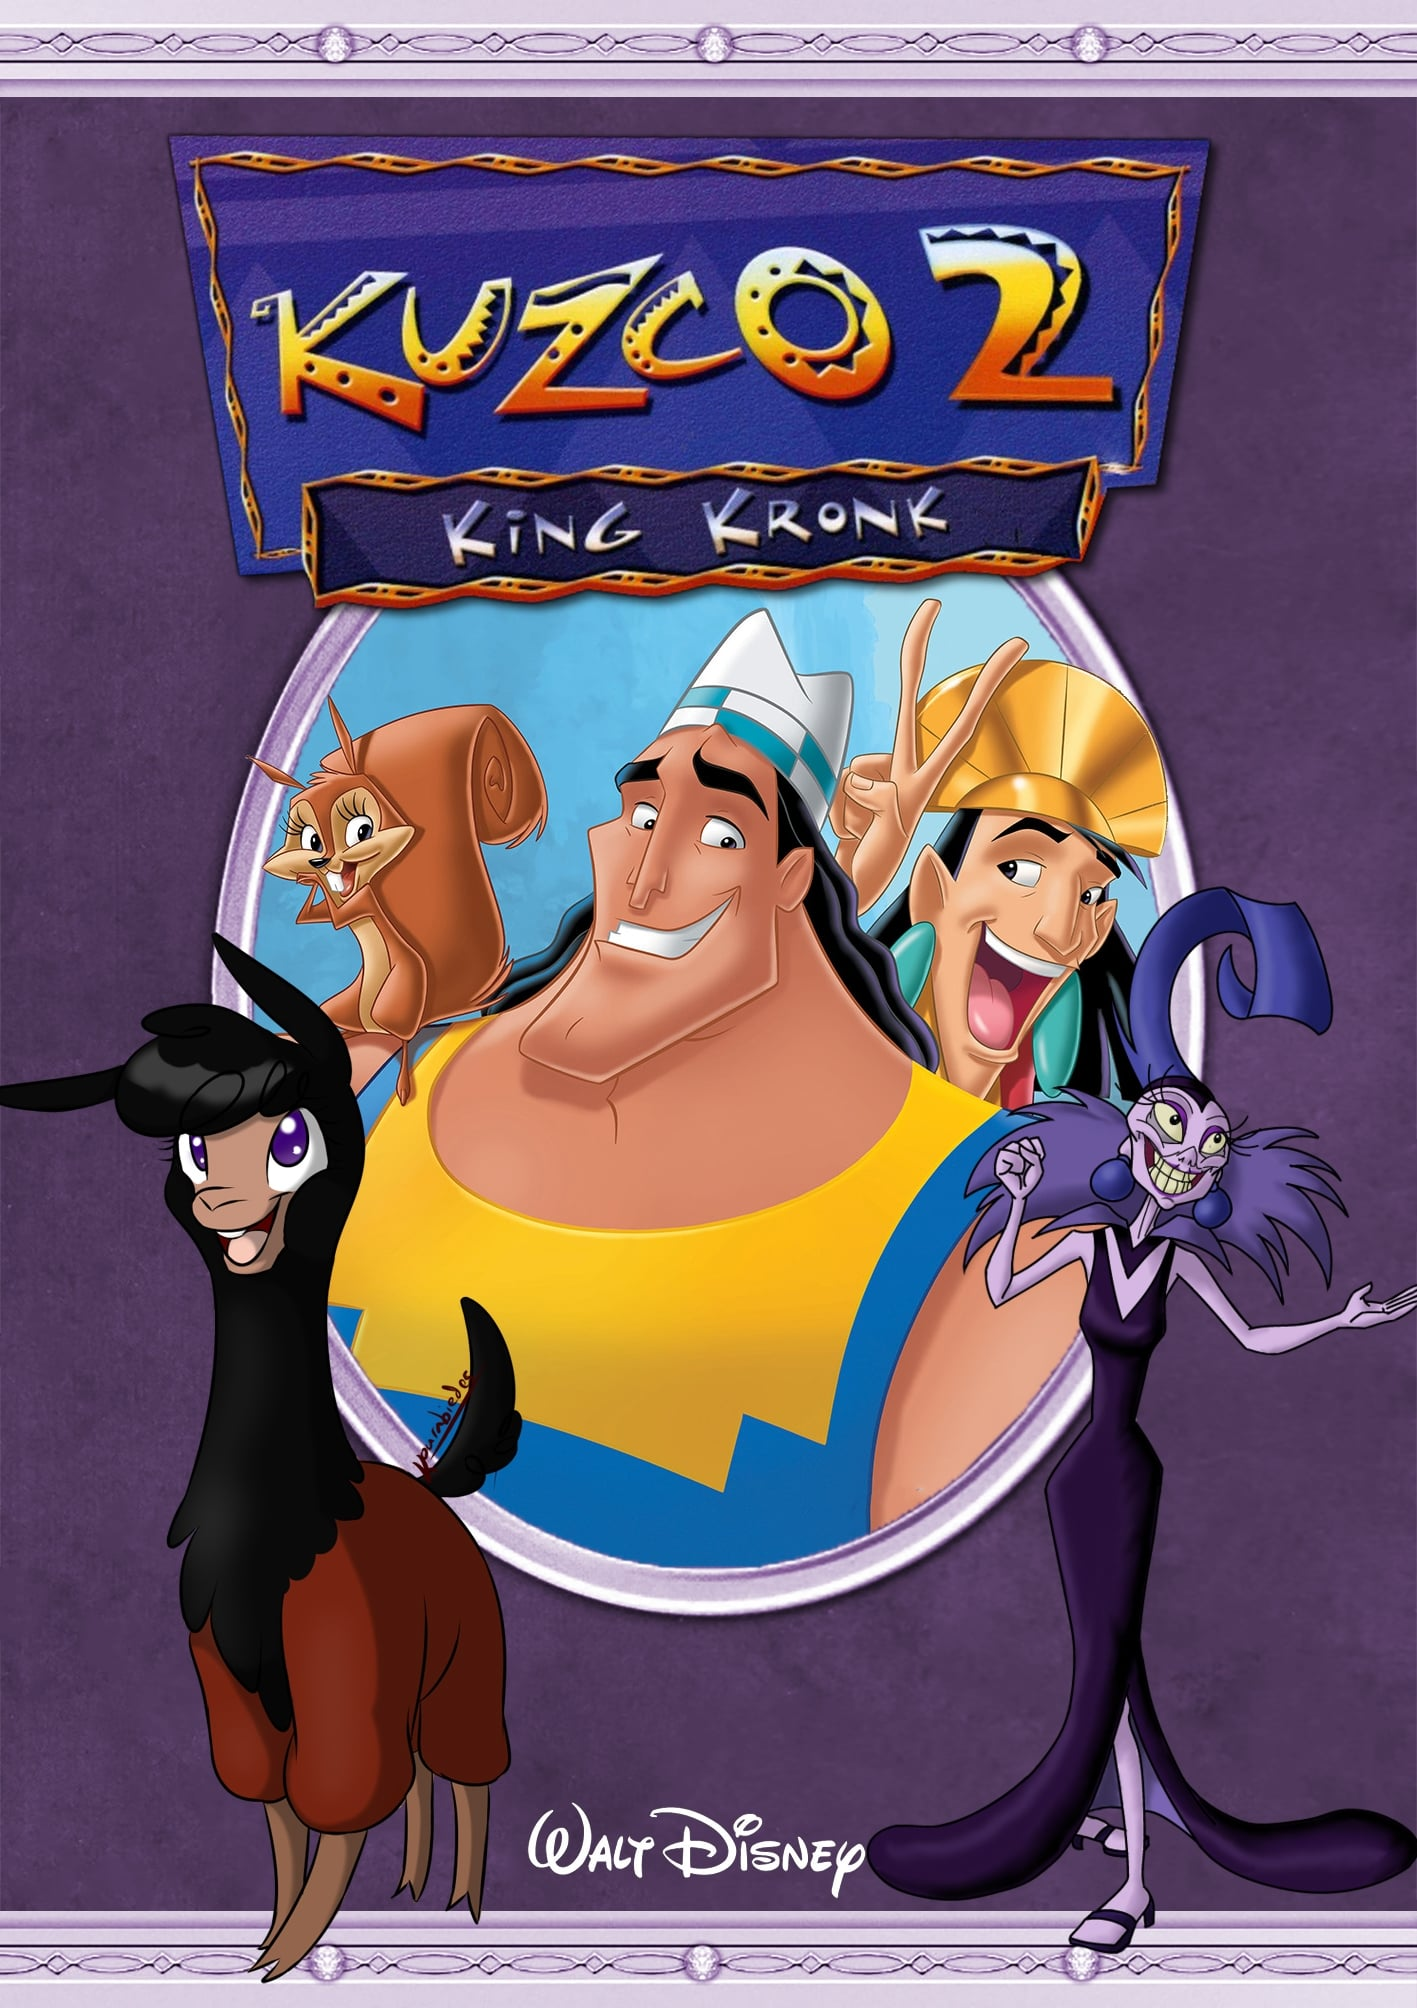 Kuzco 2 - King Kronk - 2006